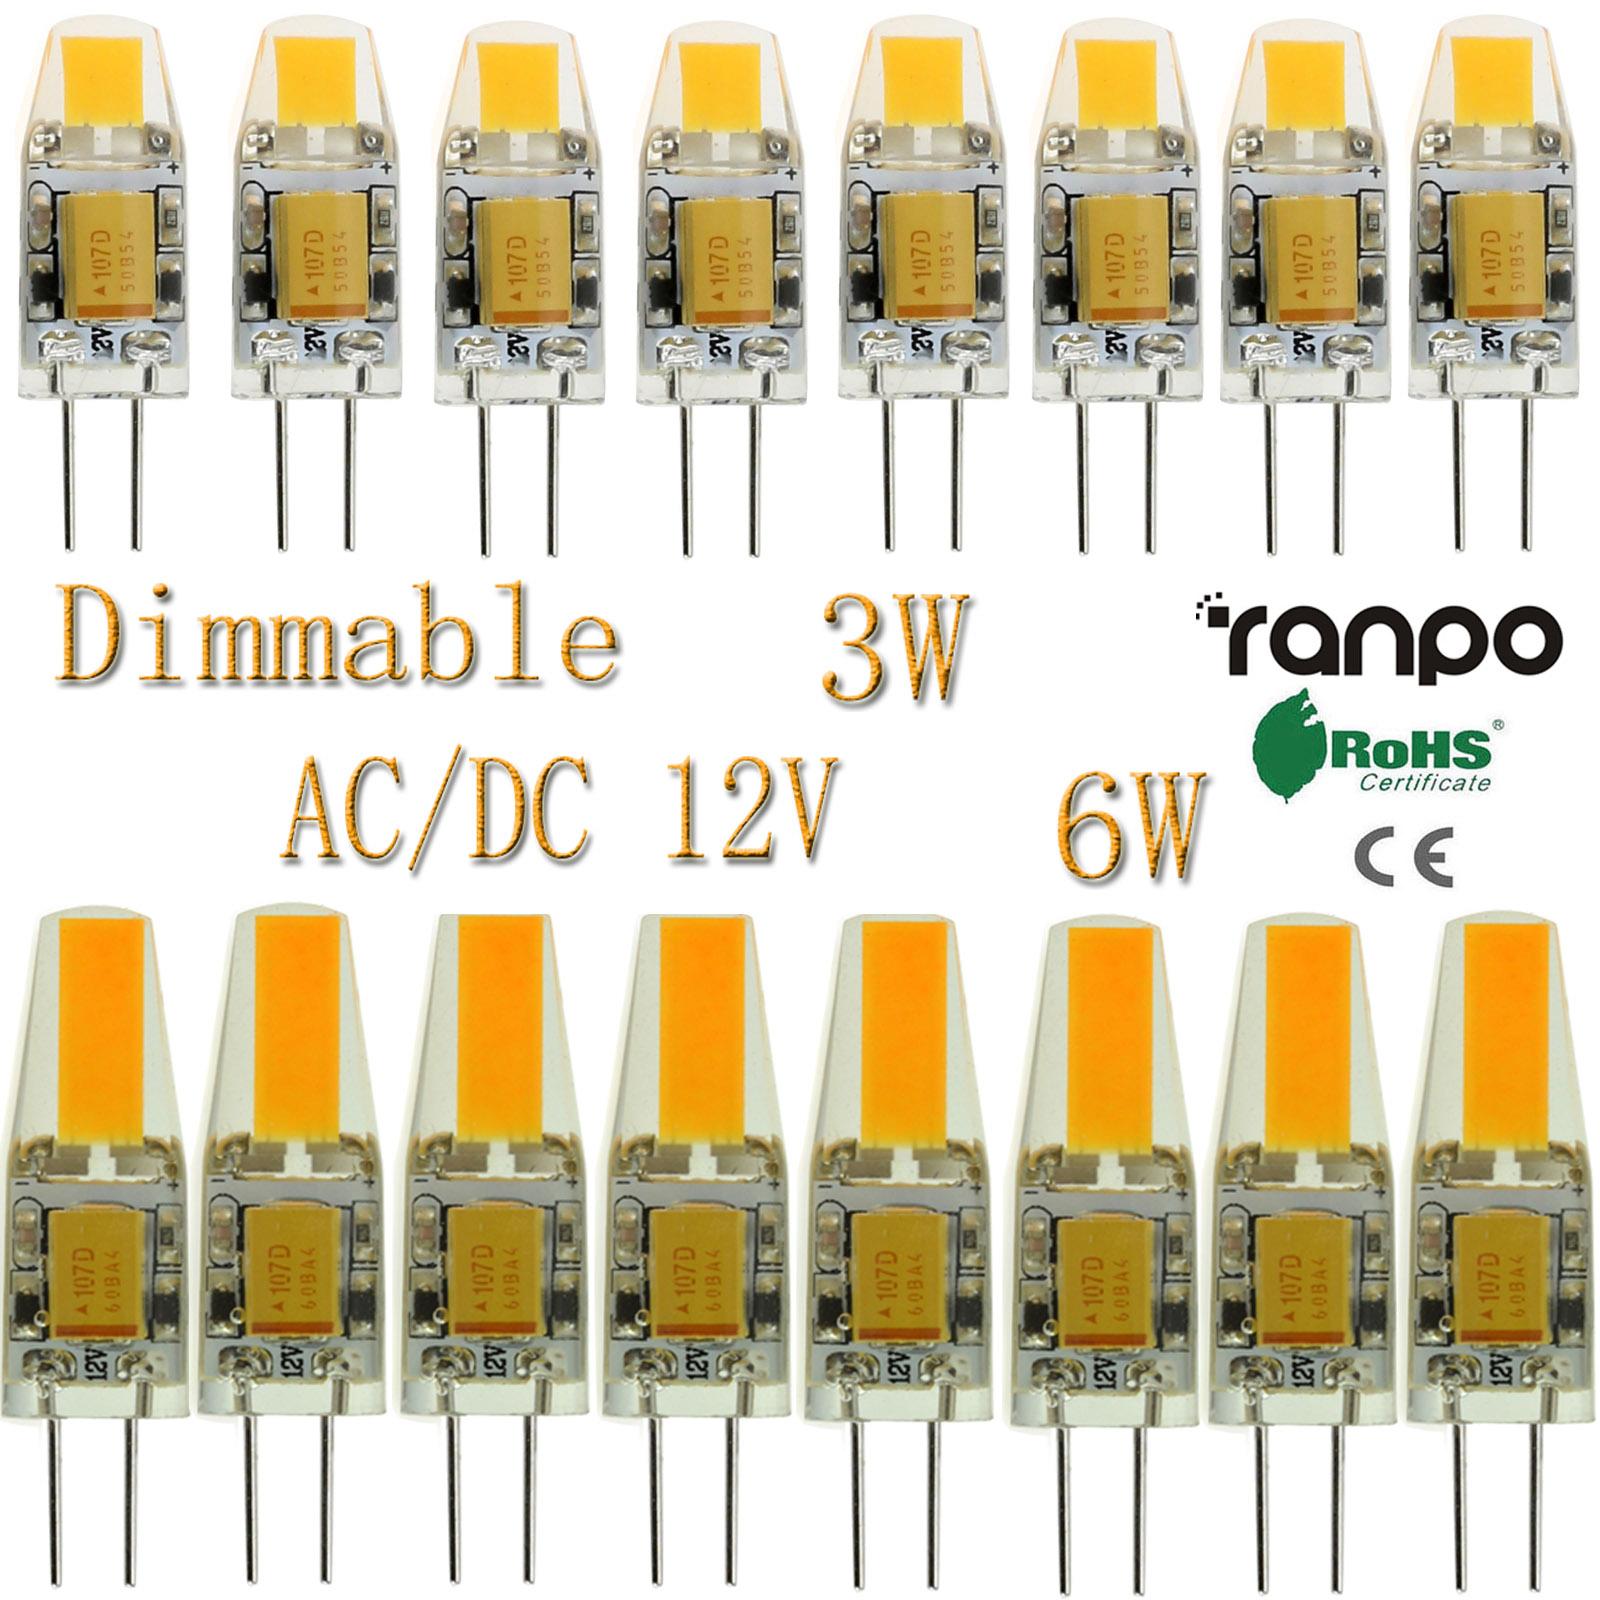 50x 100x Dimmable Led Bulbs G4 3w 6w Cob Lights Silicone Crystal Ac Circuit Lamp Dc 12v